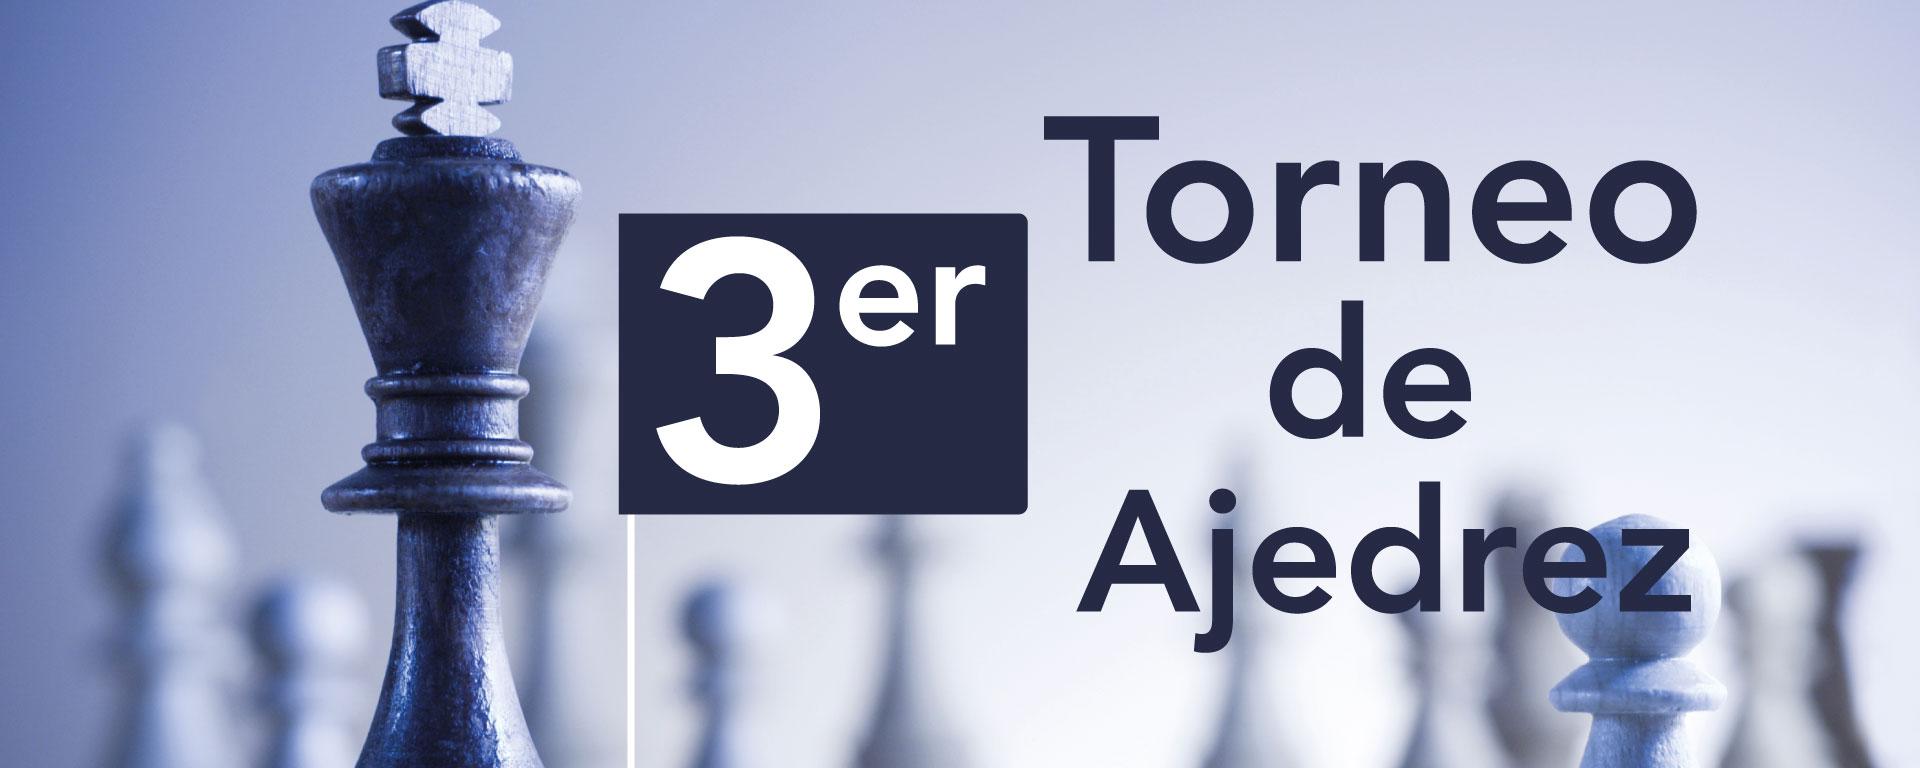 3-Torneo-de-Ajedrez-Pagina